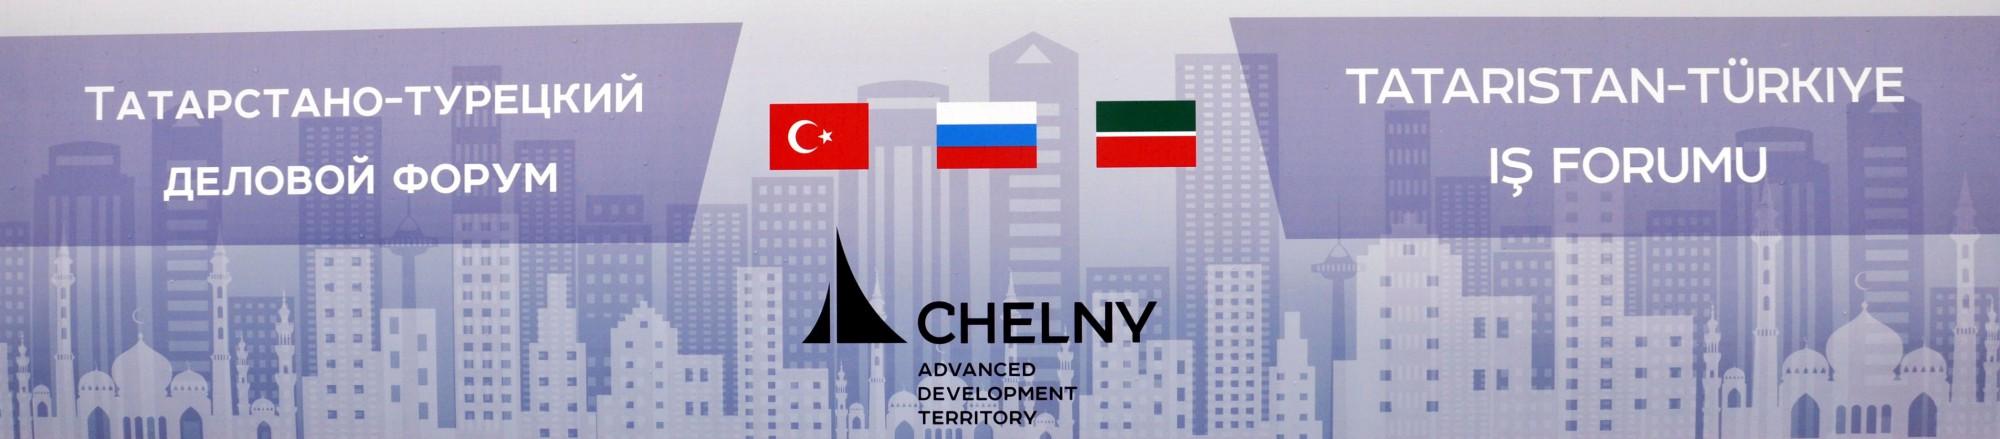 Татарстано-турецкий деловой форум